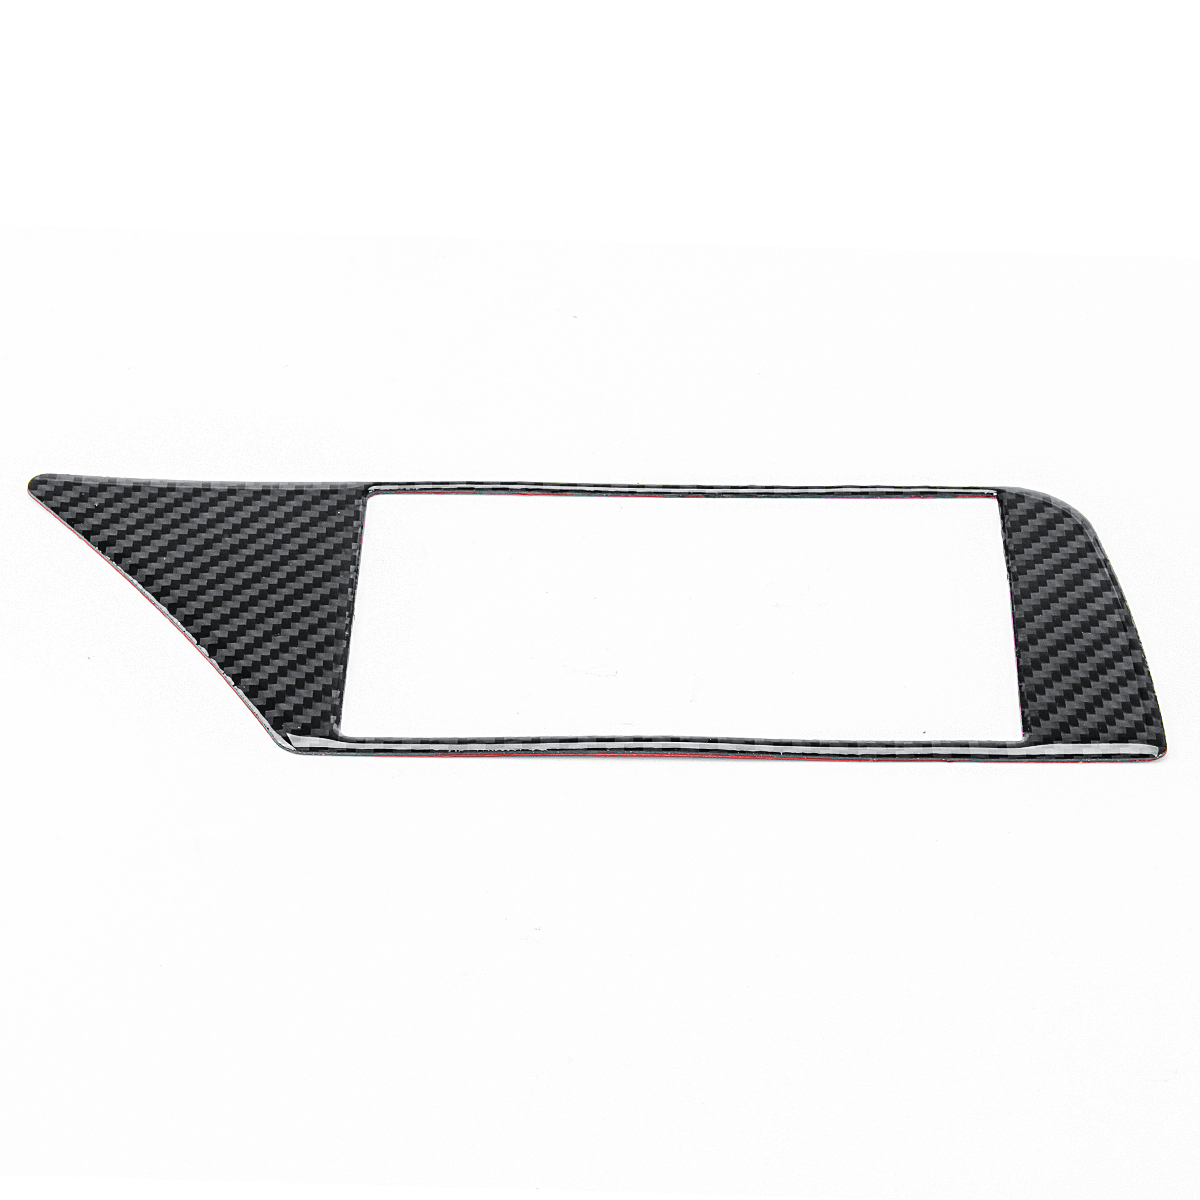 Carbon Fiber Gps Navigation Panel Frame Cover Car Stickers For Audi A4 B8